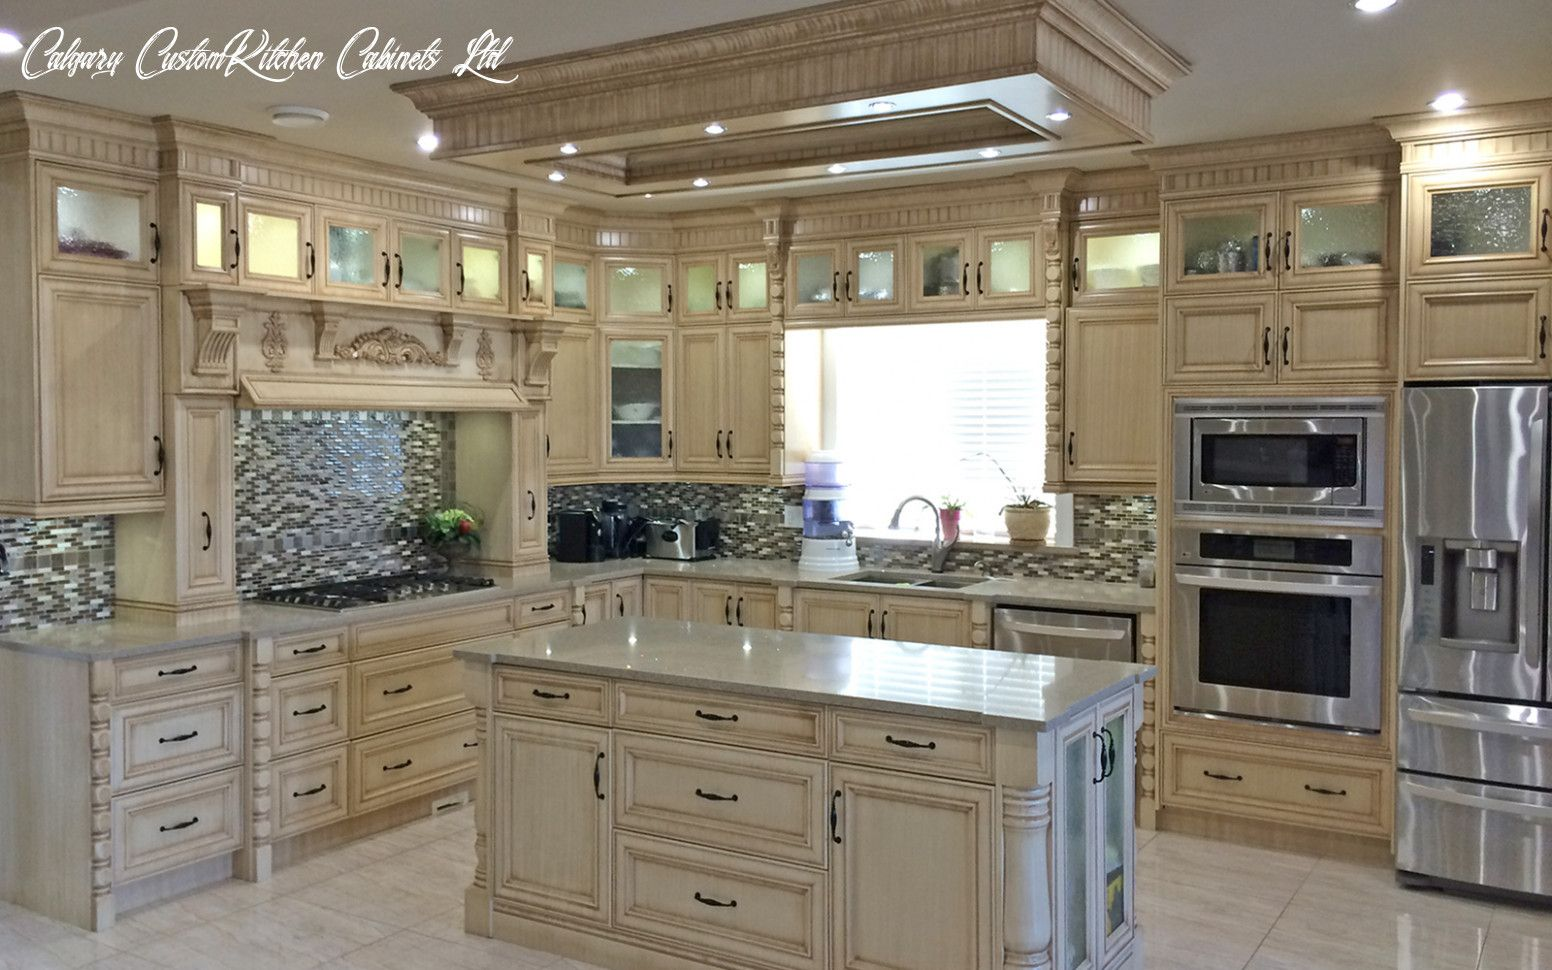 Calgary Custom Kitchen Cabinets Ltd In 2020 Kitchen Cabinet Styles Custom Kitchen Cabinets Custom Kitchens Design